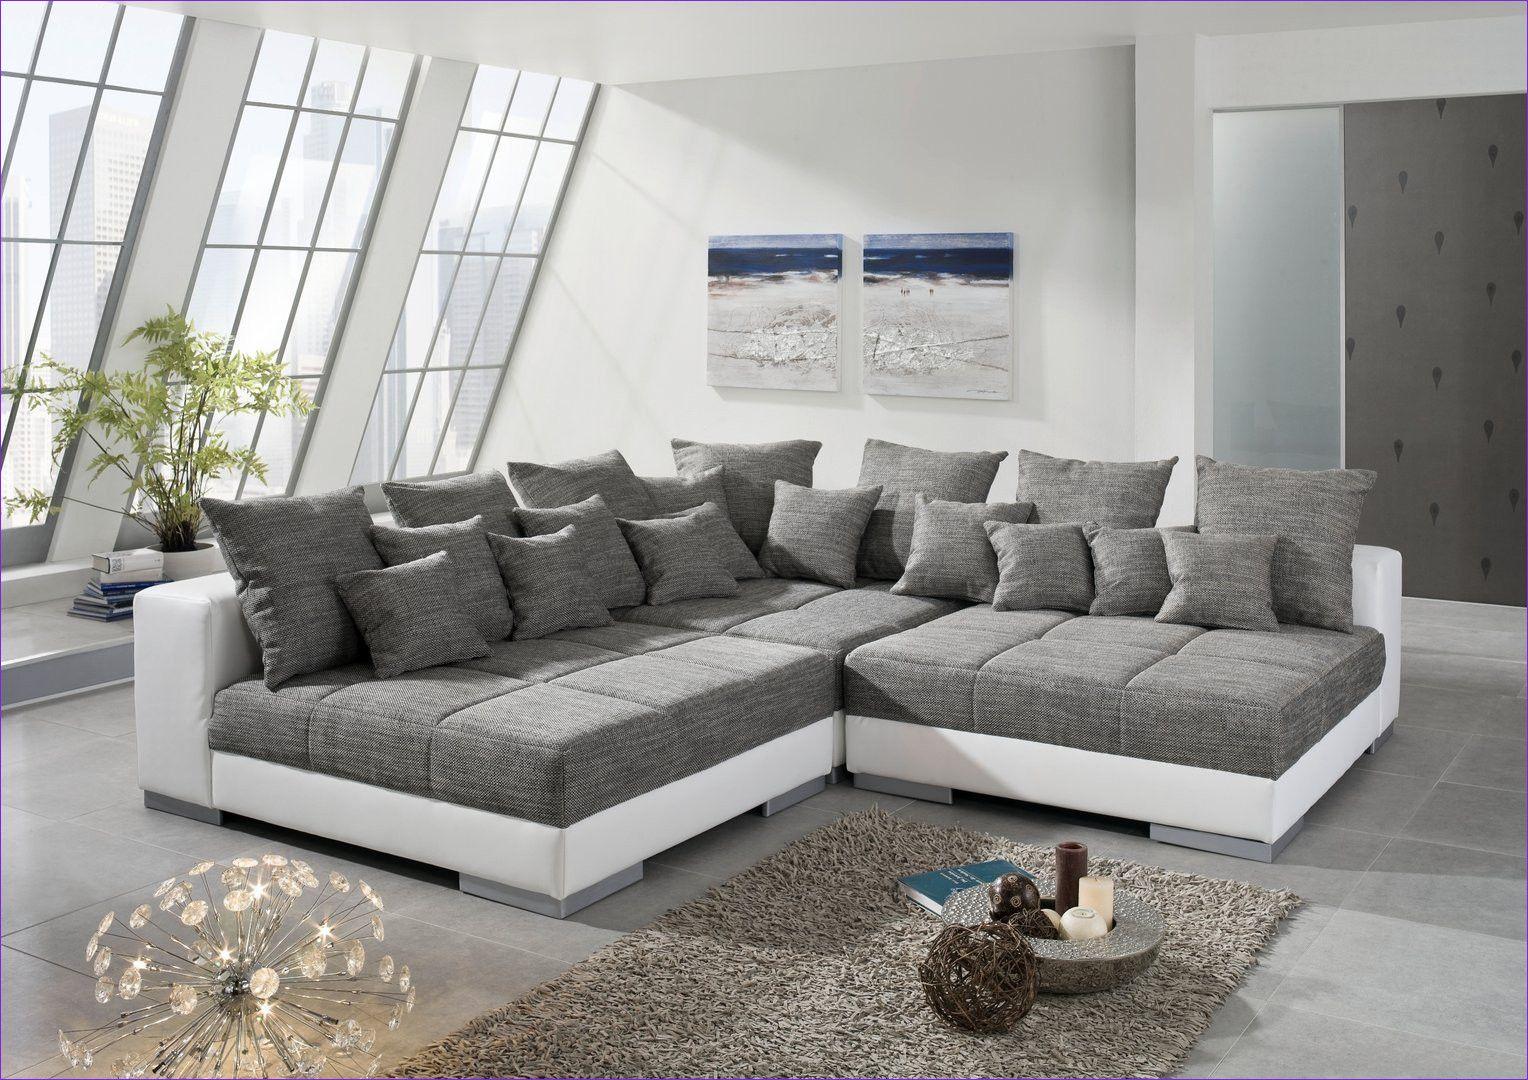 Full Size of Big Sofa Roller Sam L Form Bei Grau Kolonialstil Rot Arizona Toronto Couch U Xxl Polyrattan Bezug Ecksofa Mit Ottomane Auf Raten Leder Braun Hocker 2er Xxxl Wohnzimmer Big Sofa Roller